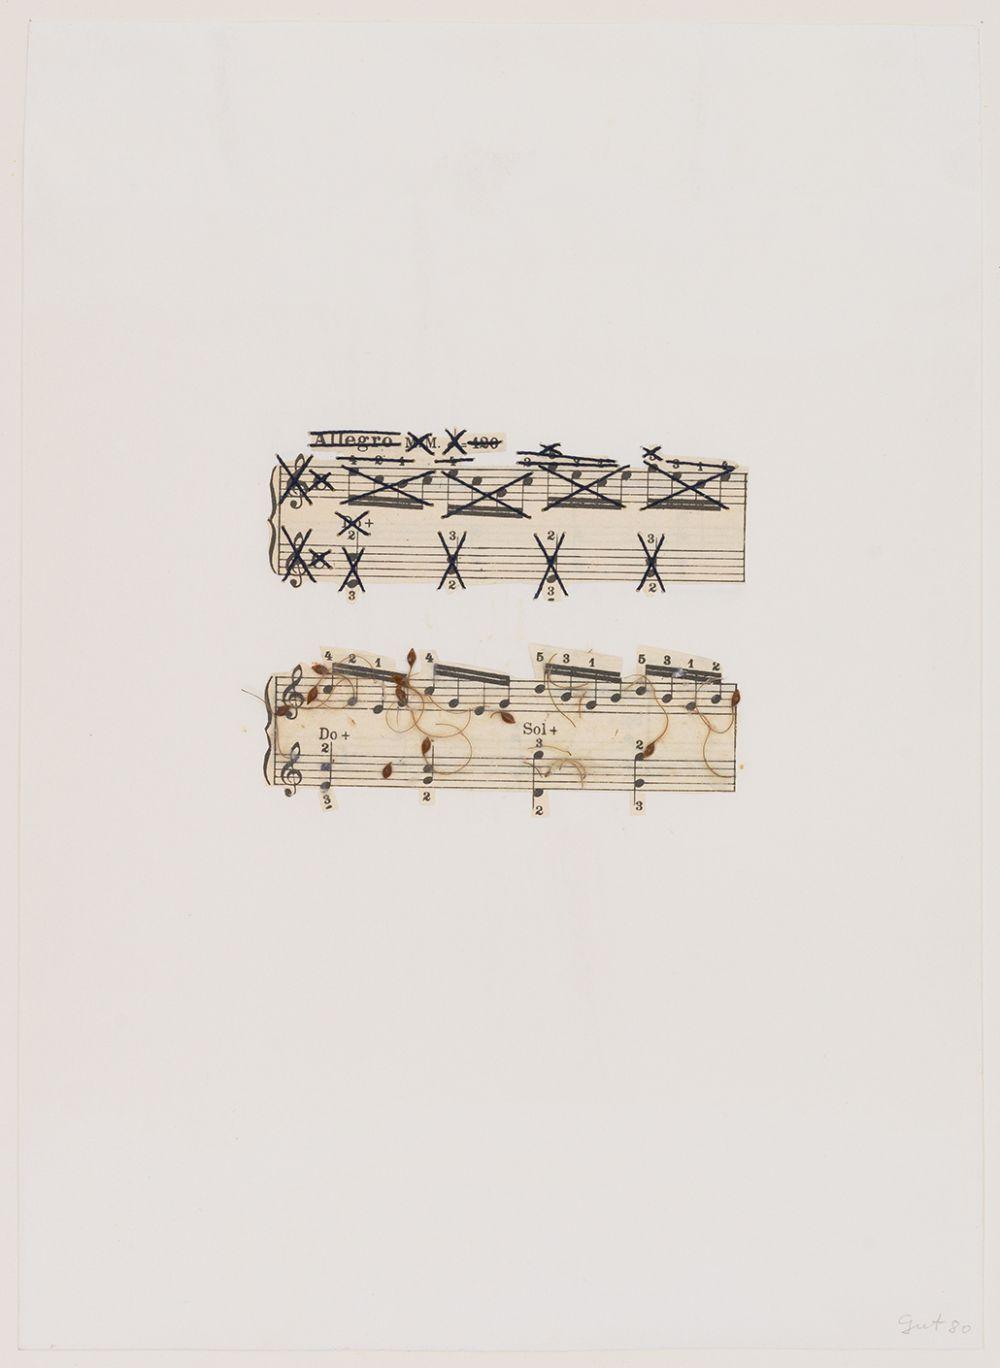 Pagine musicali